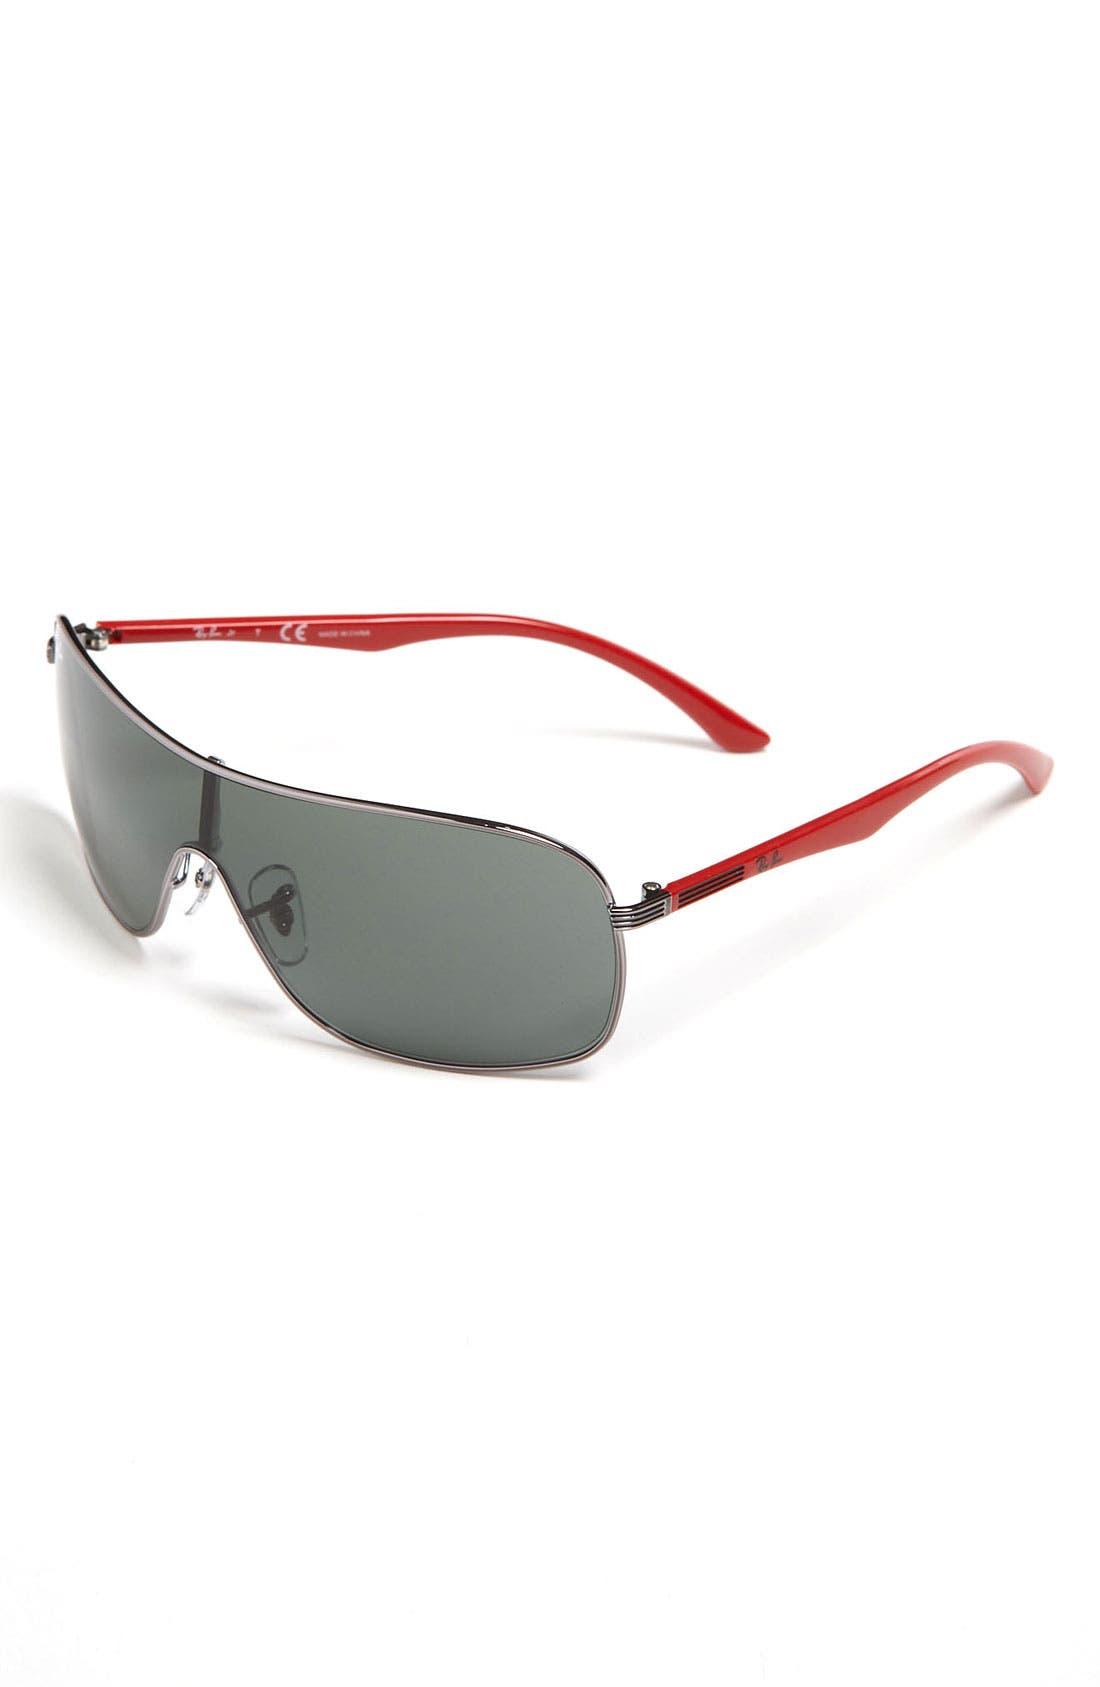 Alternate Image 1 Selected - Ray-Ban 65mm Shield Sunglasses (Big Boys)